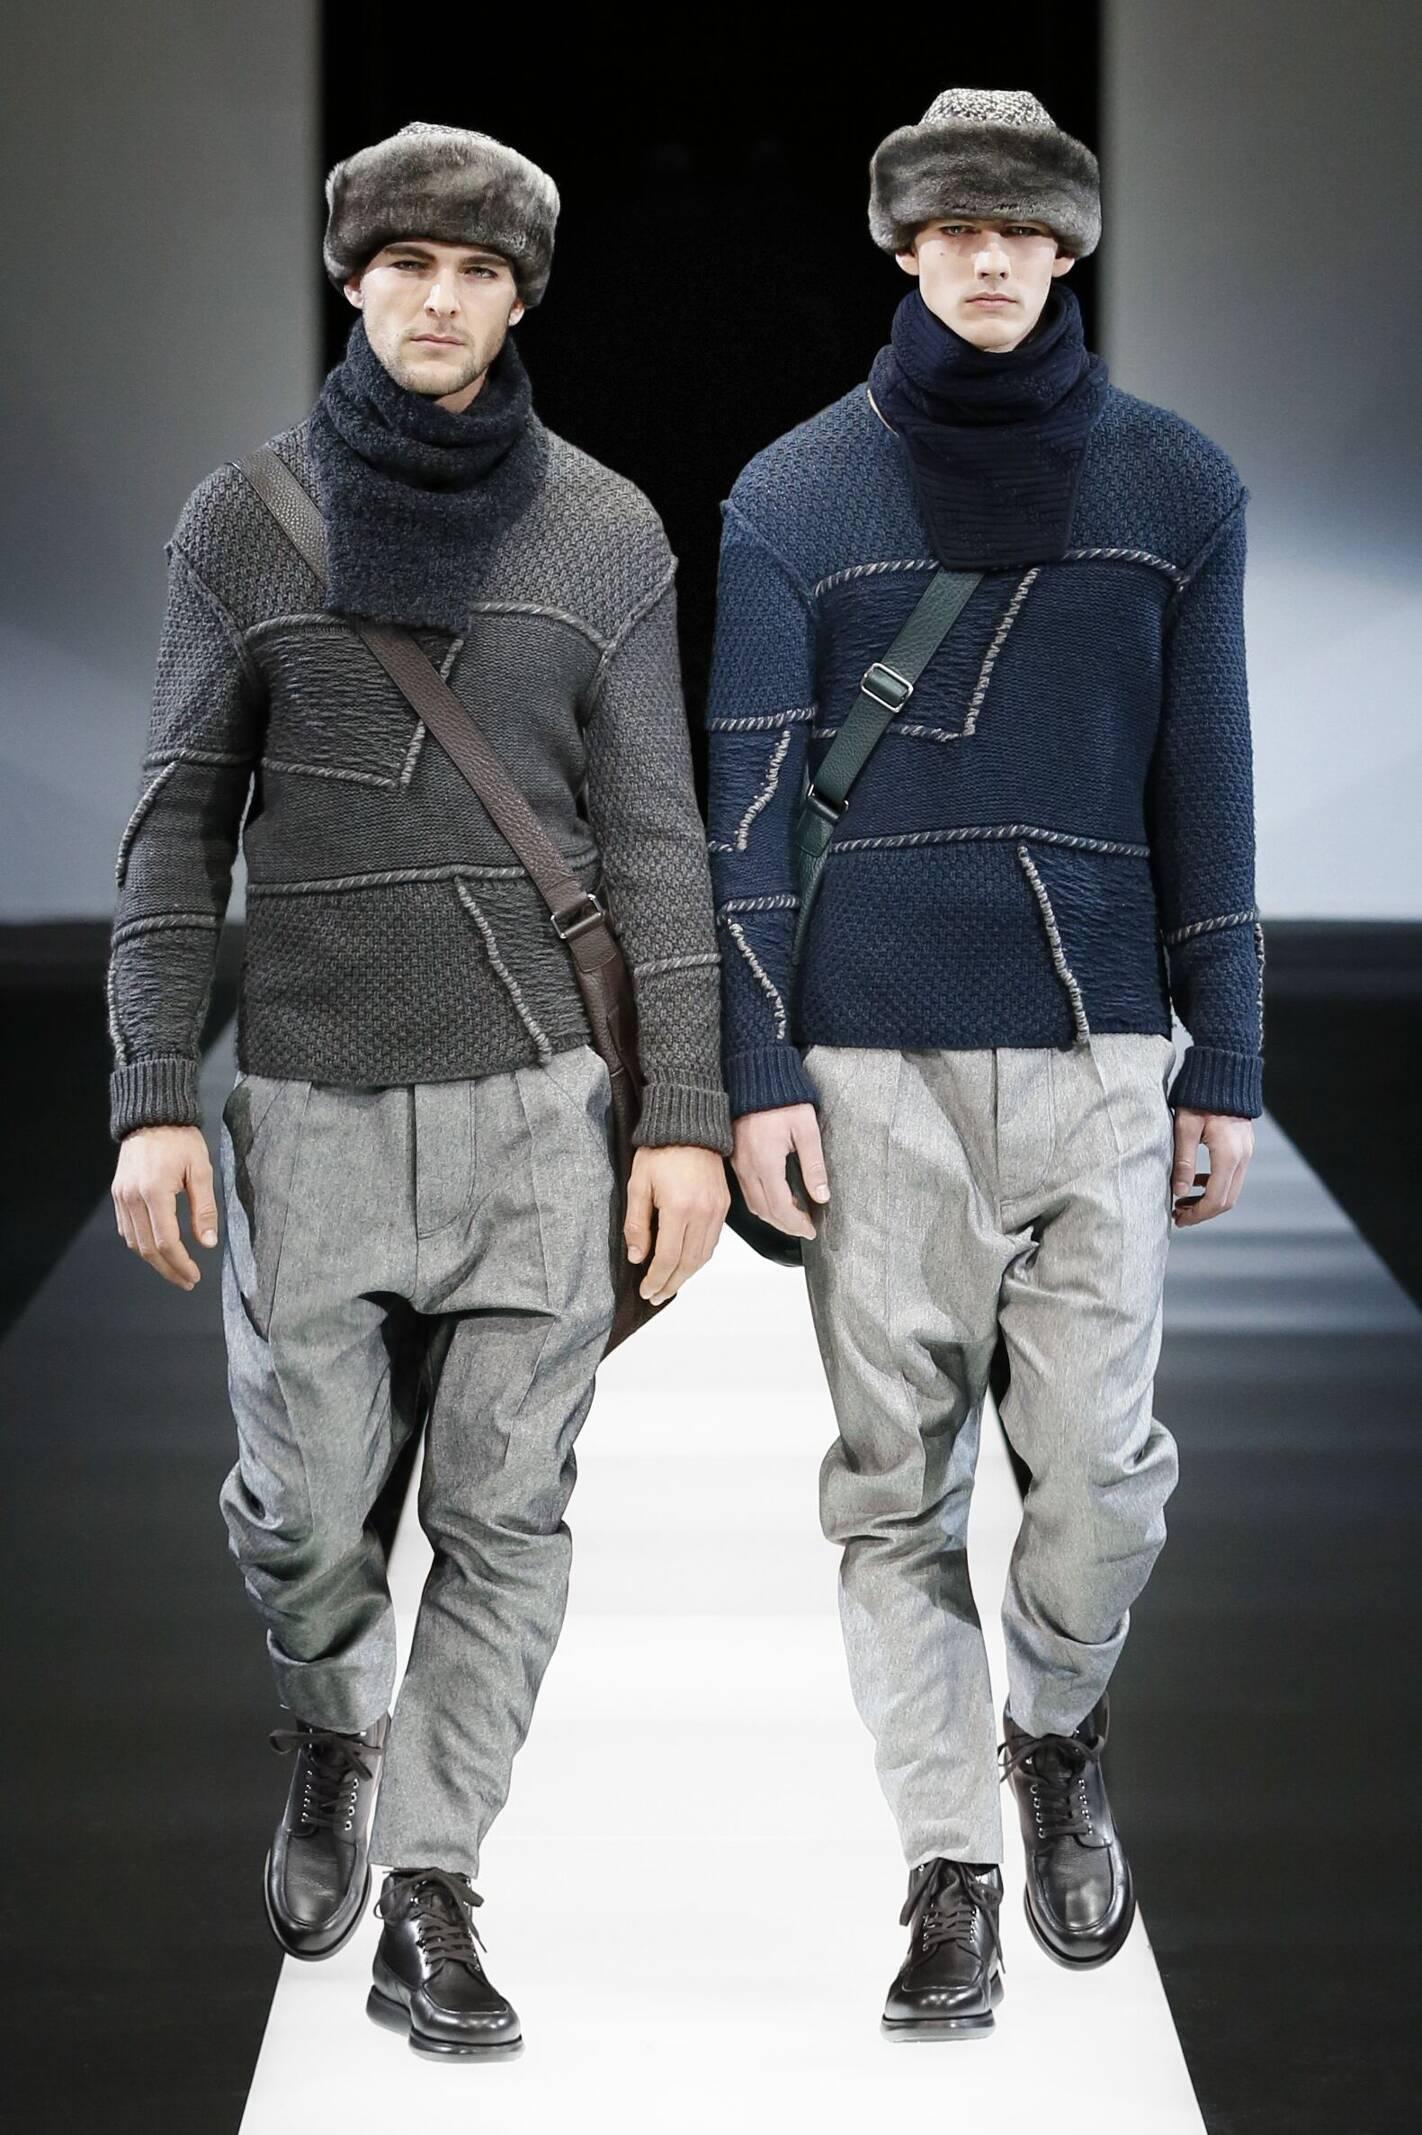 Giorgio Armani Collection Fashion Show FW 2015 2016